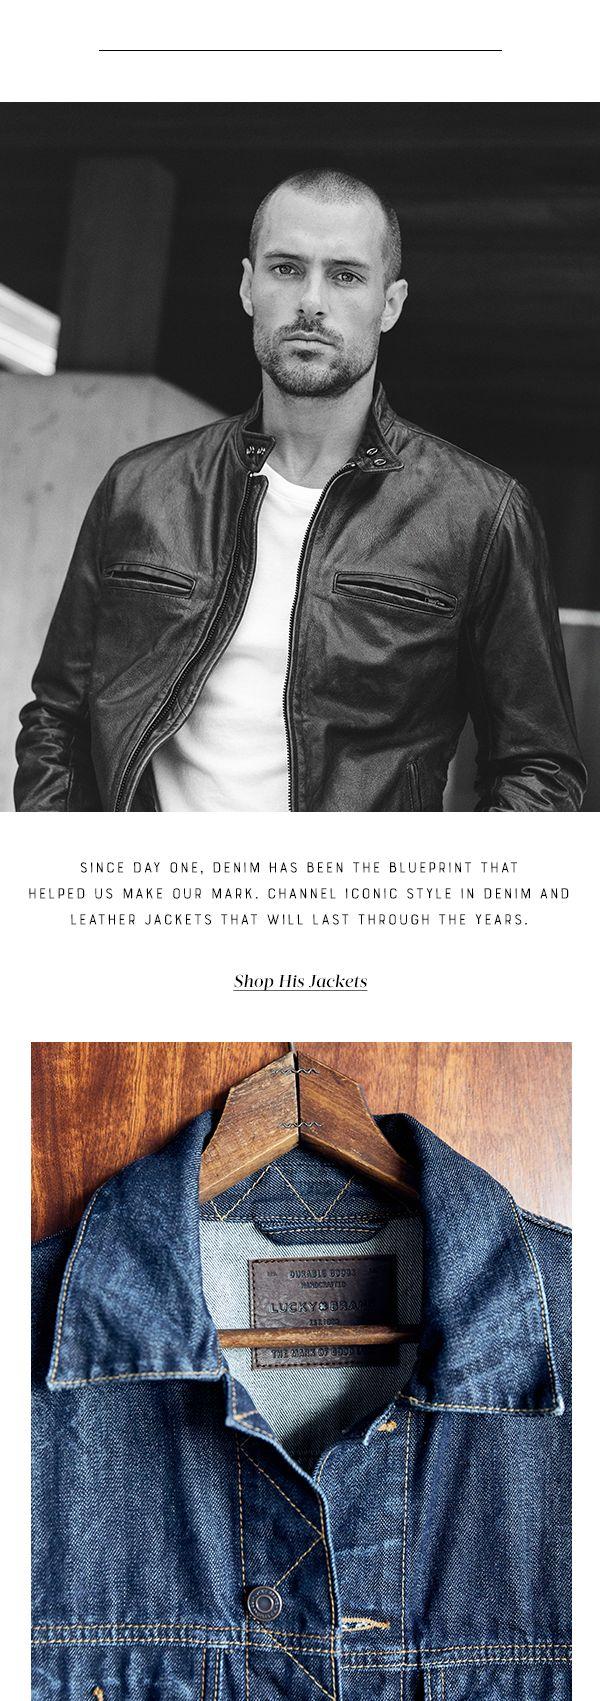 Shop His Jackets